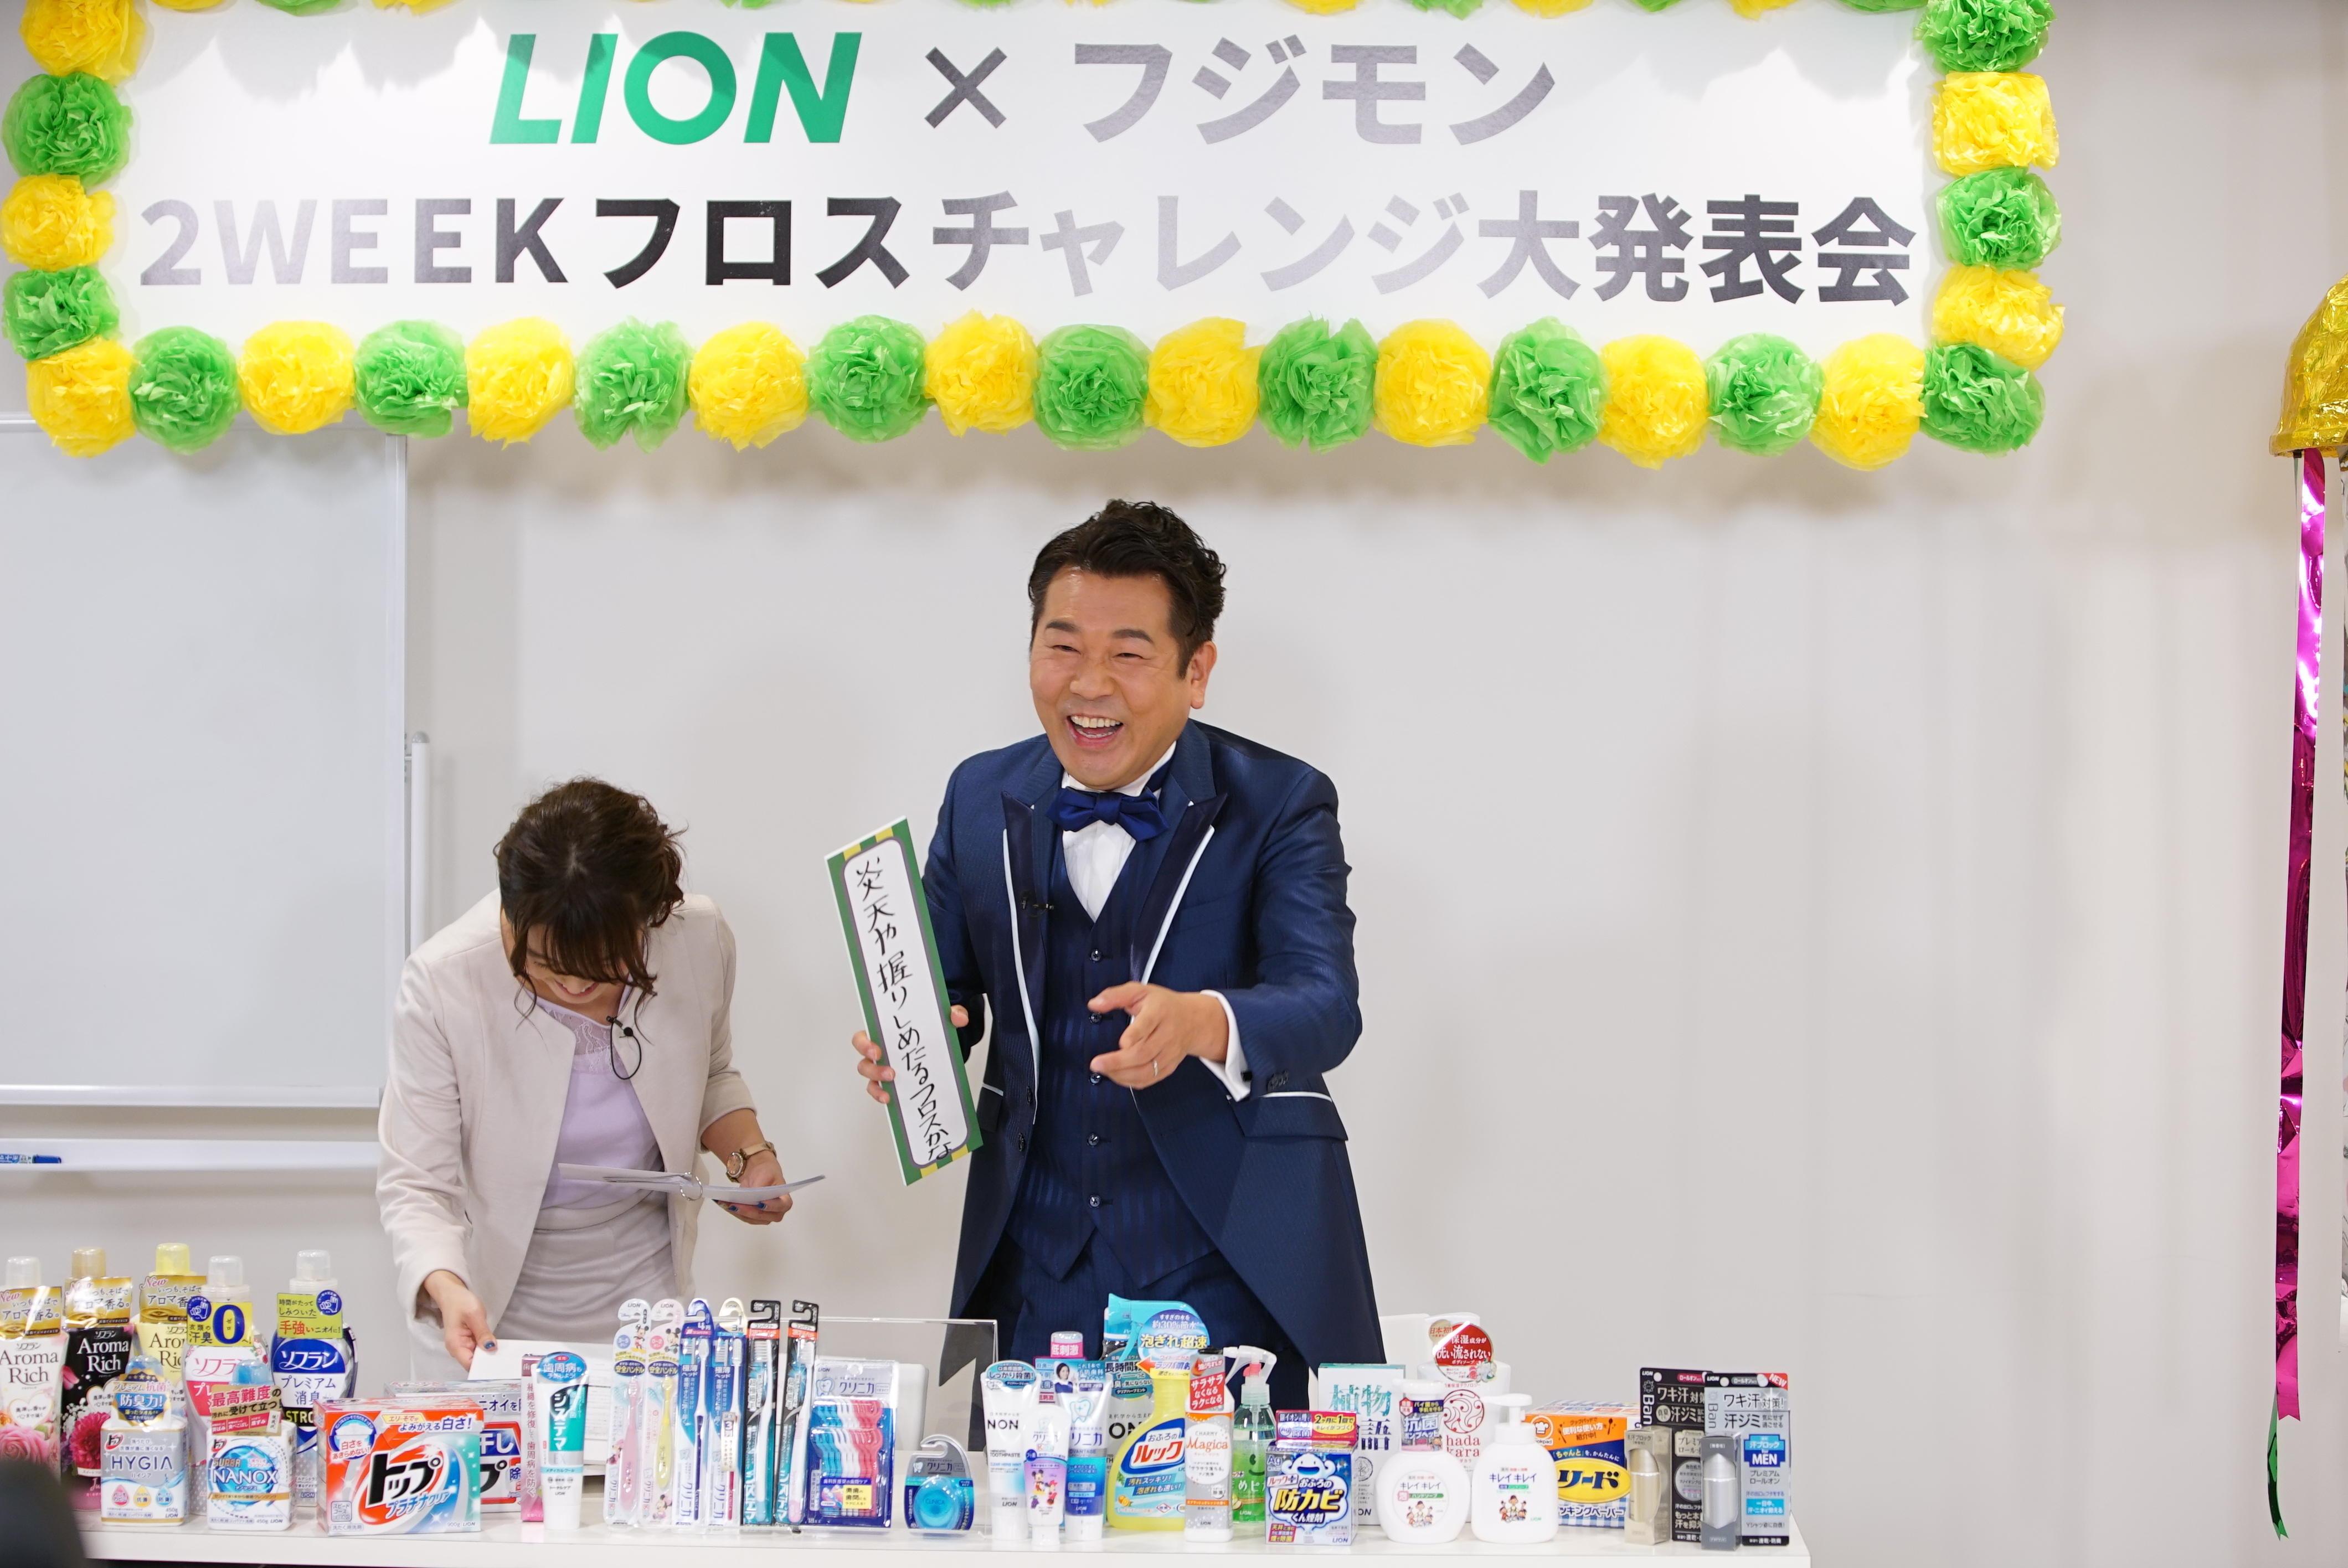 http://news.yoshimoto.co.jp/20180712104257-e65a9652236a11275aa8822b32430088d329e148.jpg